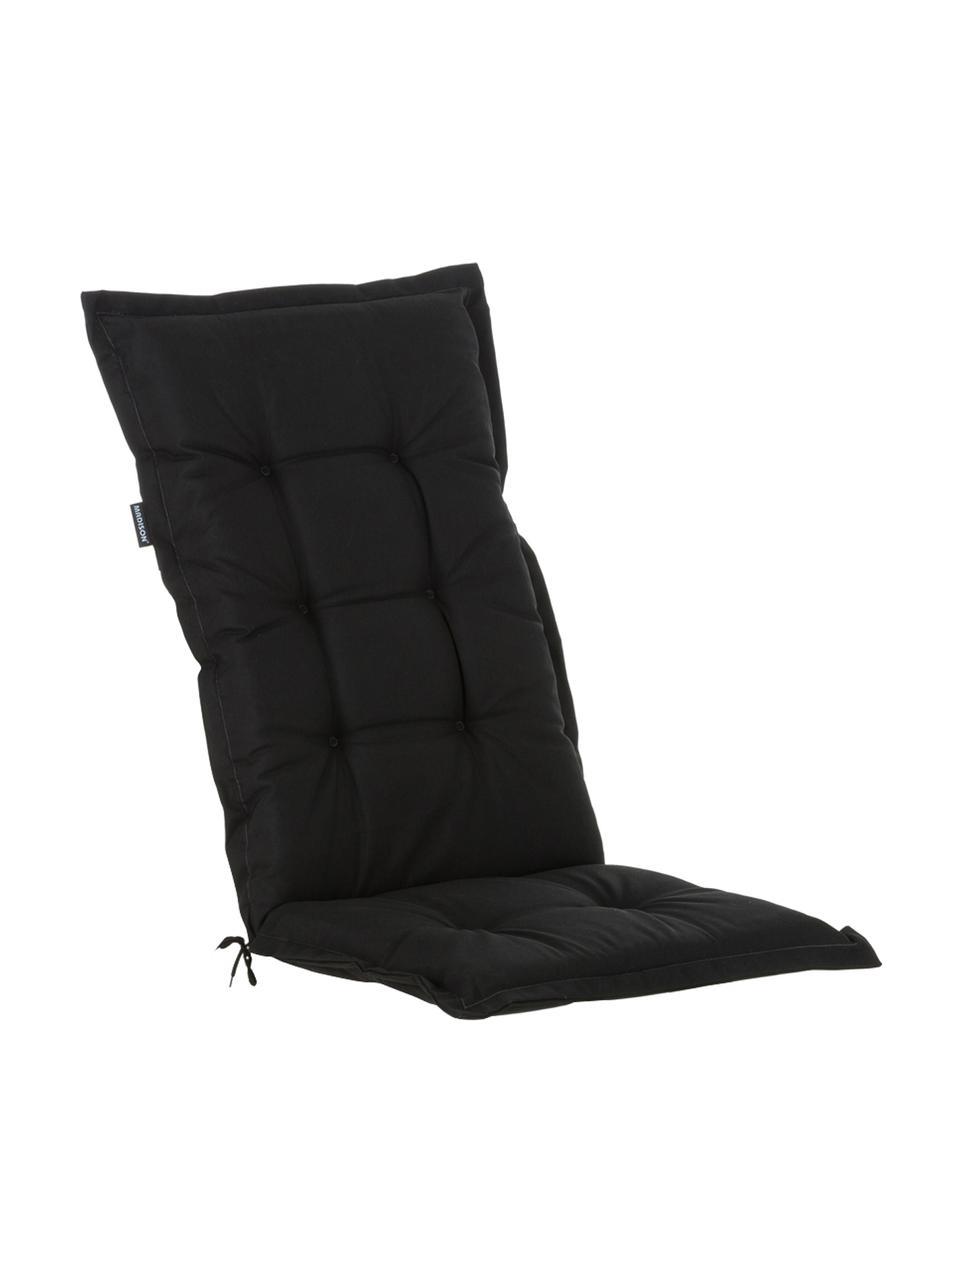 Cojín para silla con respaldo Panama, Funda: 50%algodón, 50%poliéste, Negro, An 50 x L 123 cm